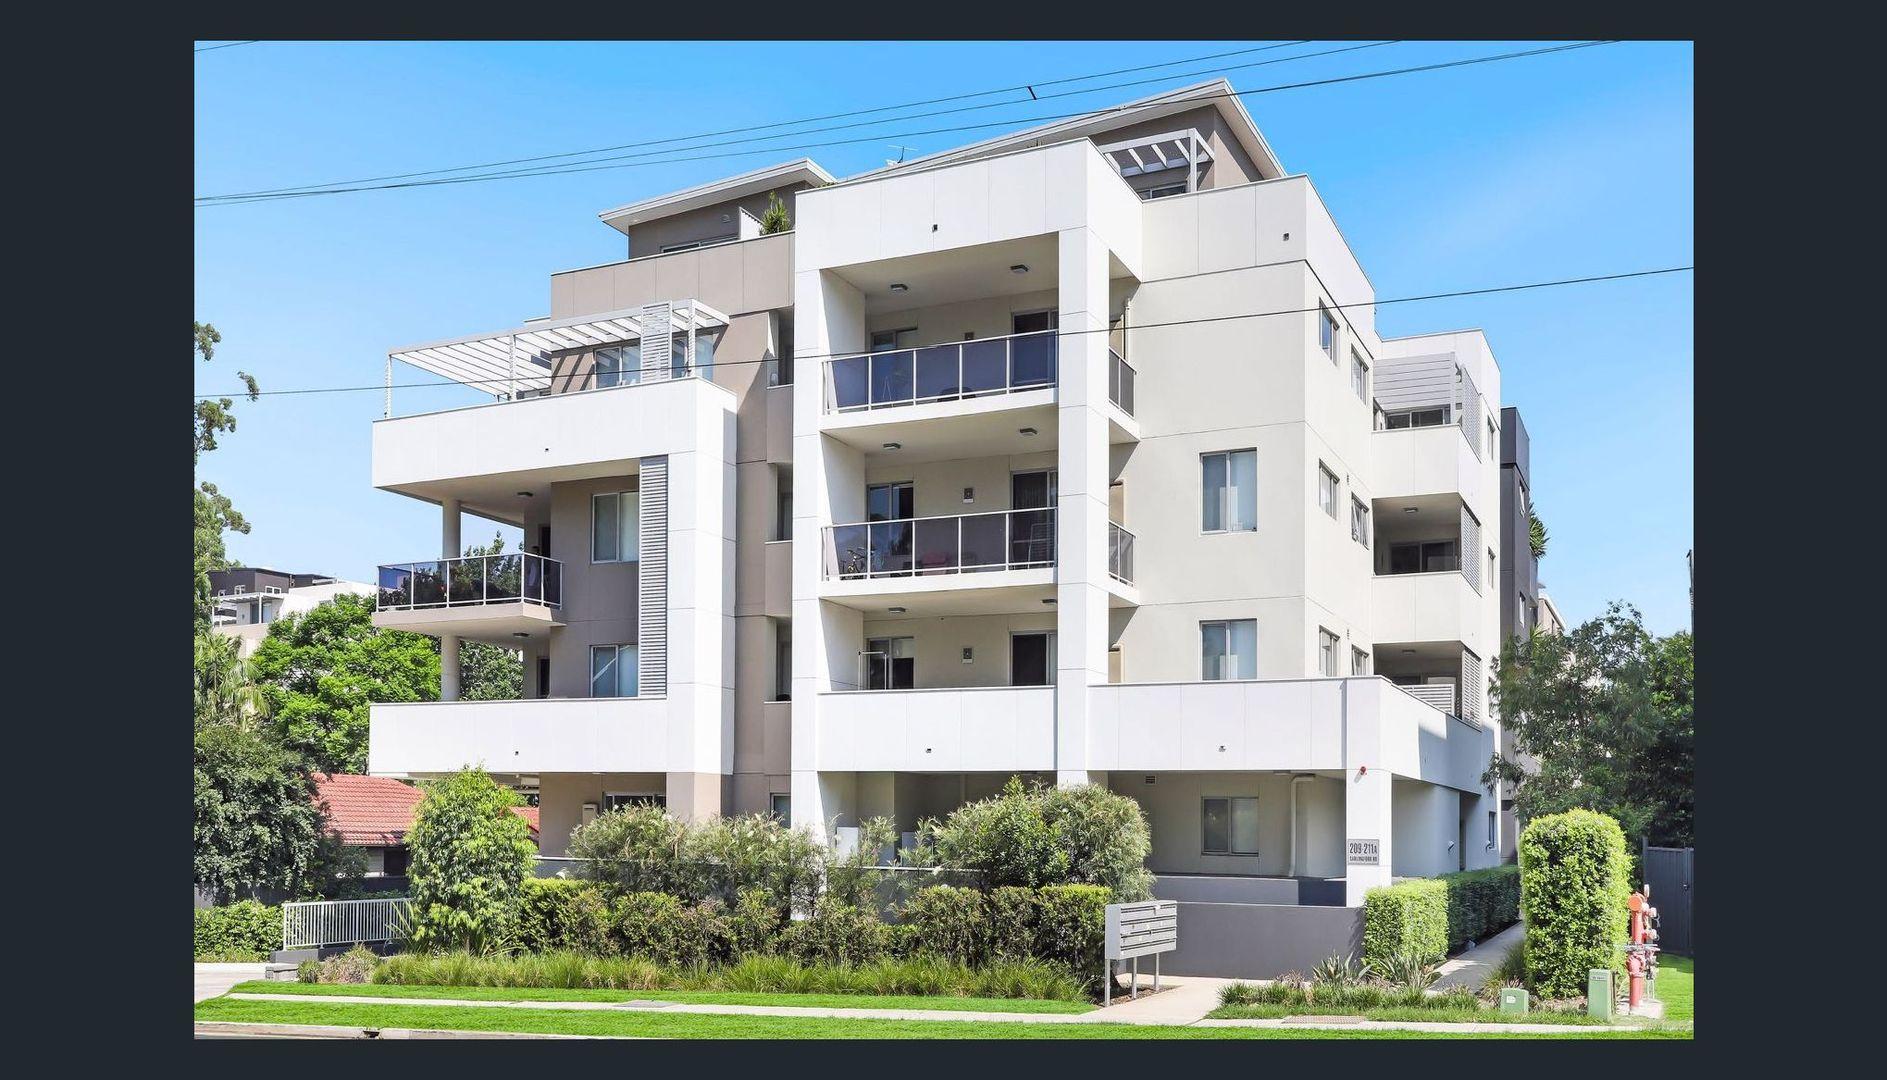 2/209-211 Carlingford Rd, Carlingford NSW 2118, Image 0